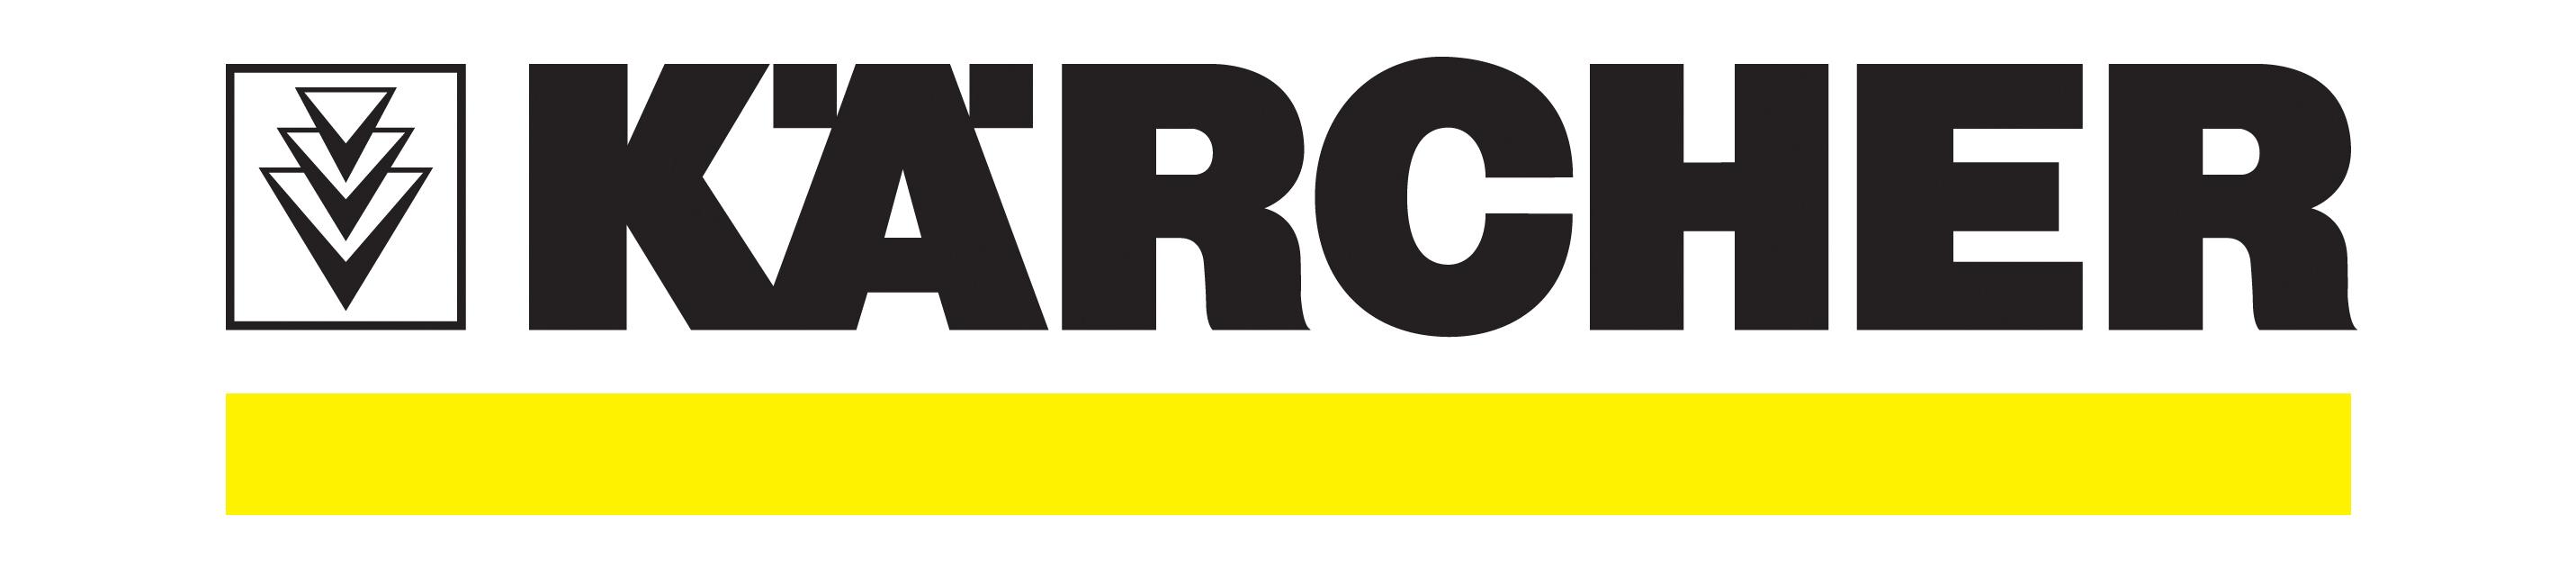 REAM elettroutensili Ferrara K'A'RCHER Logo